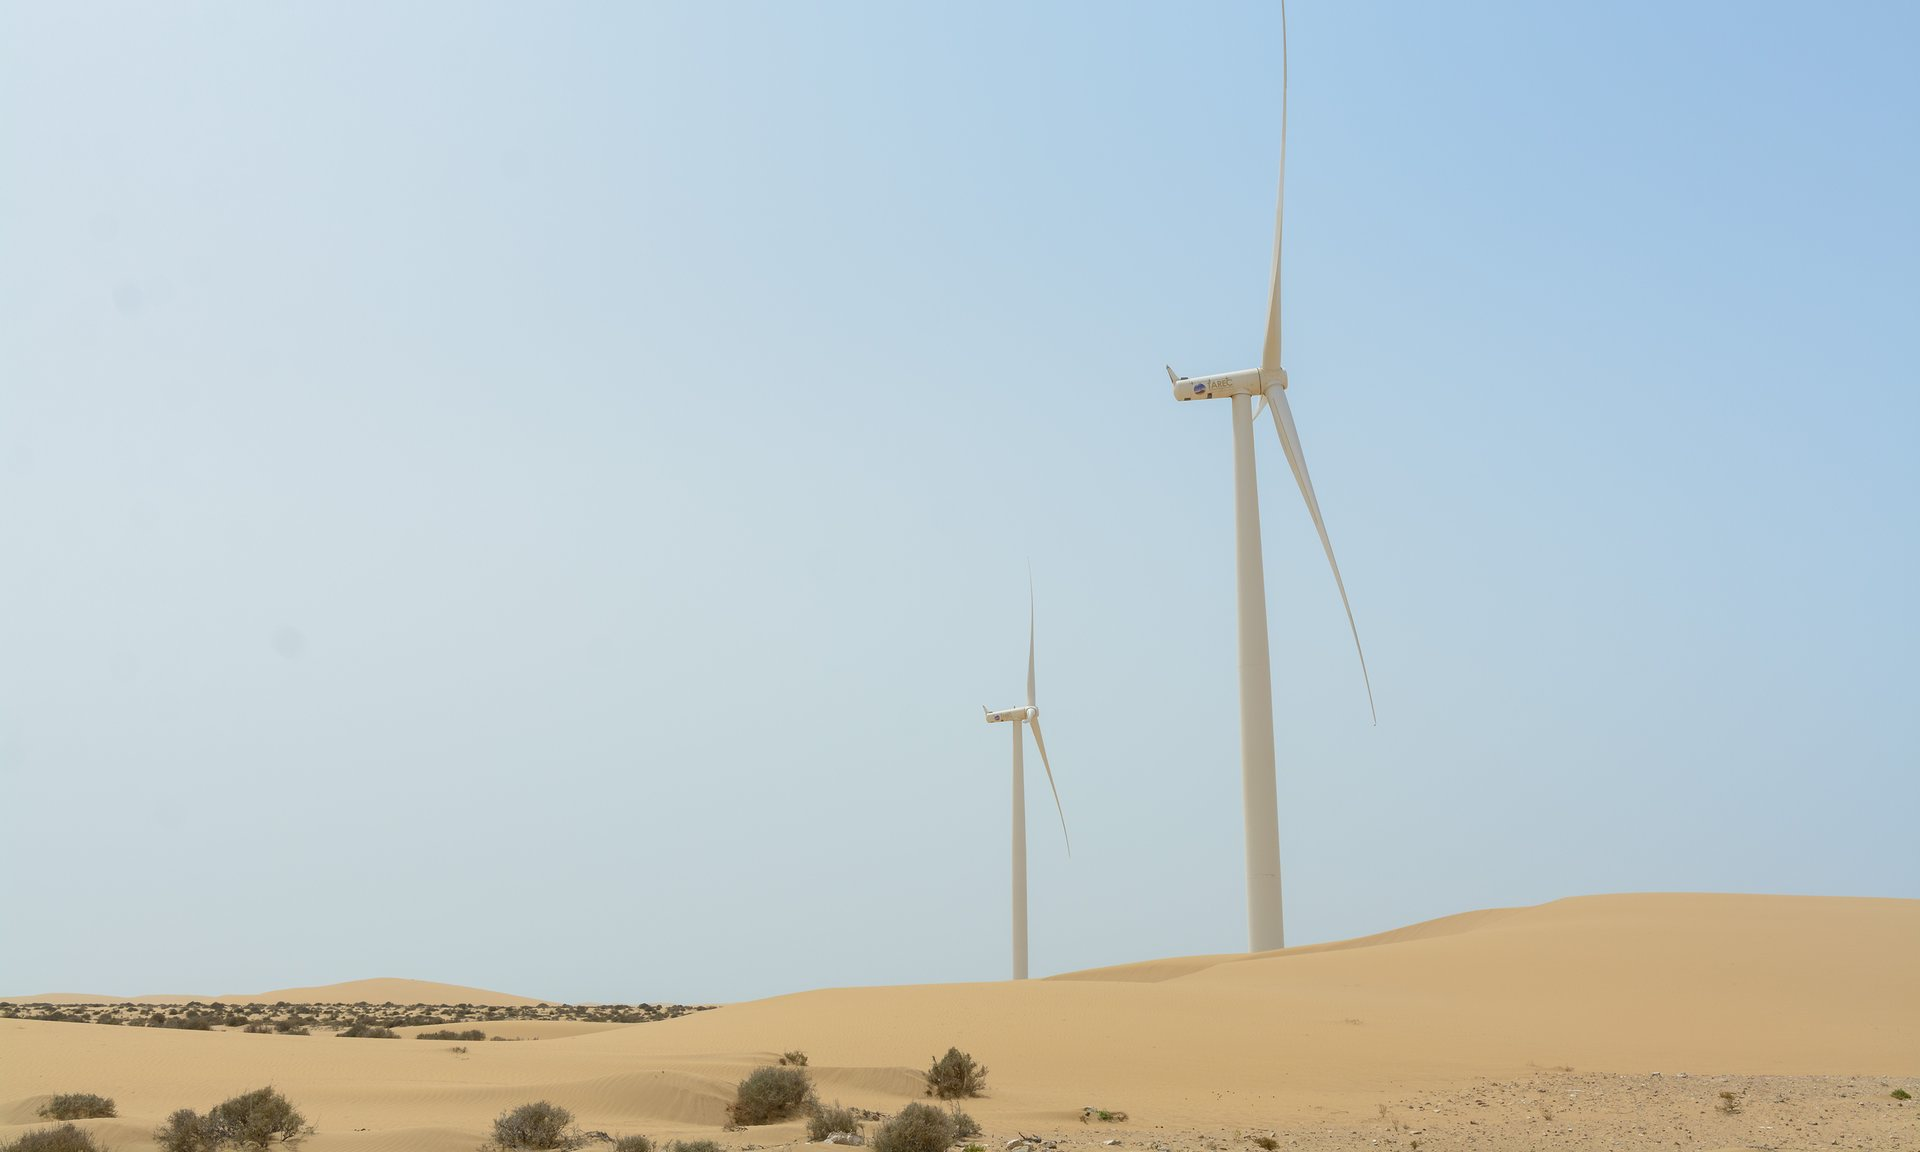 Morocco Western Sahara wind energy panies in Western Sahara